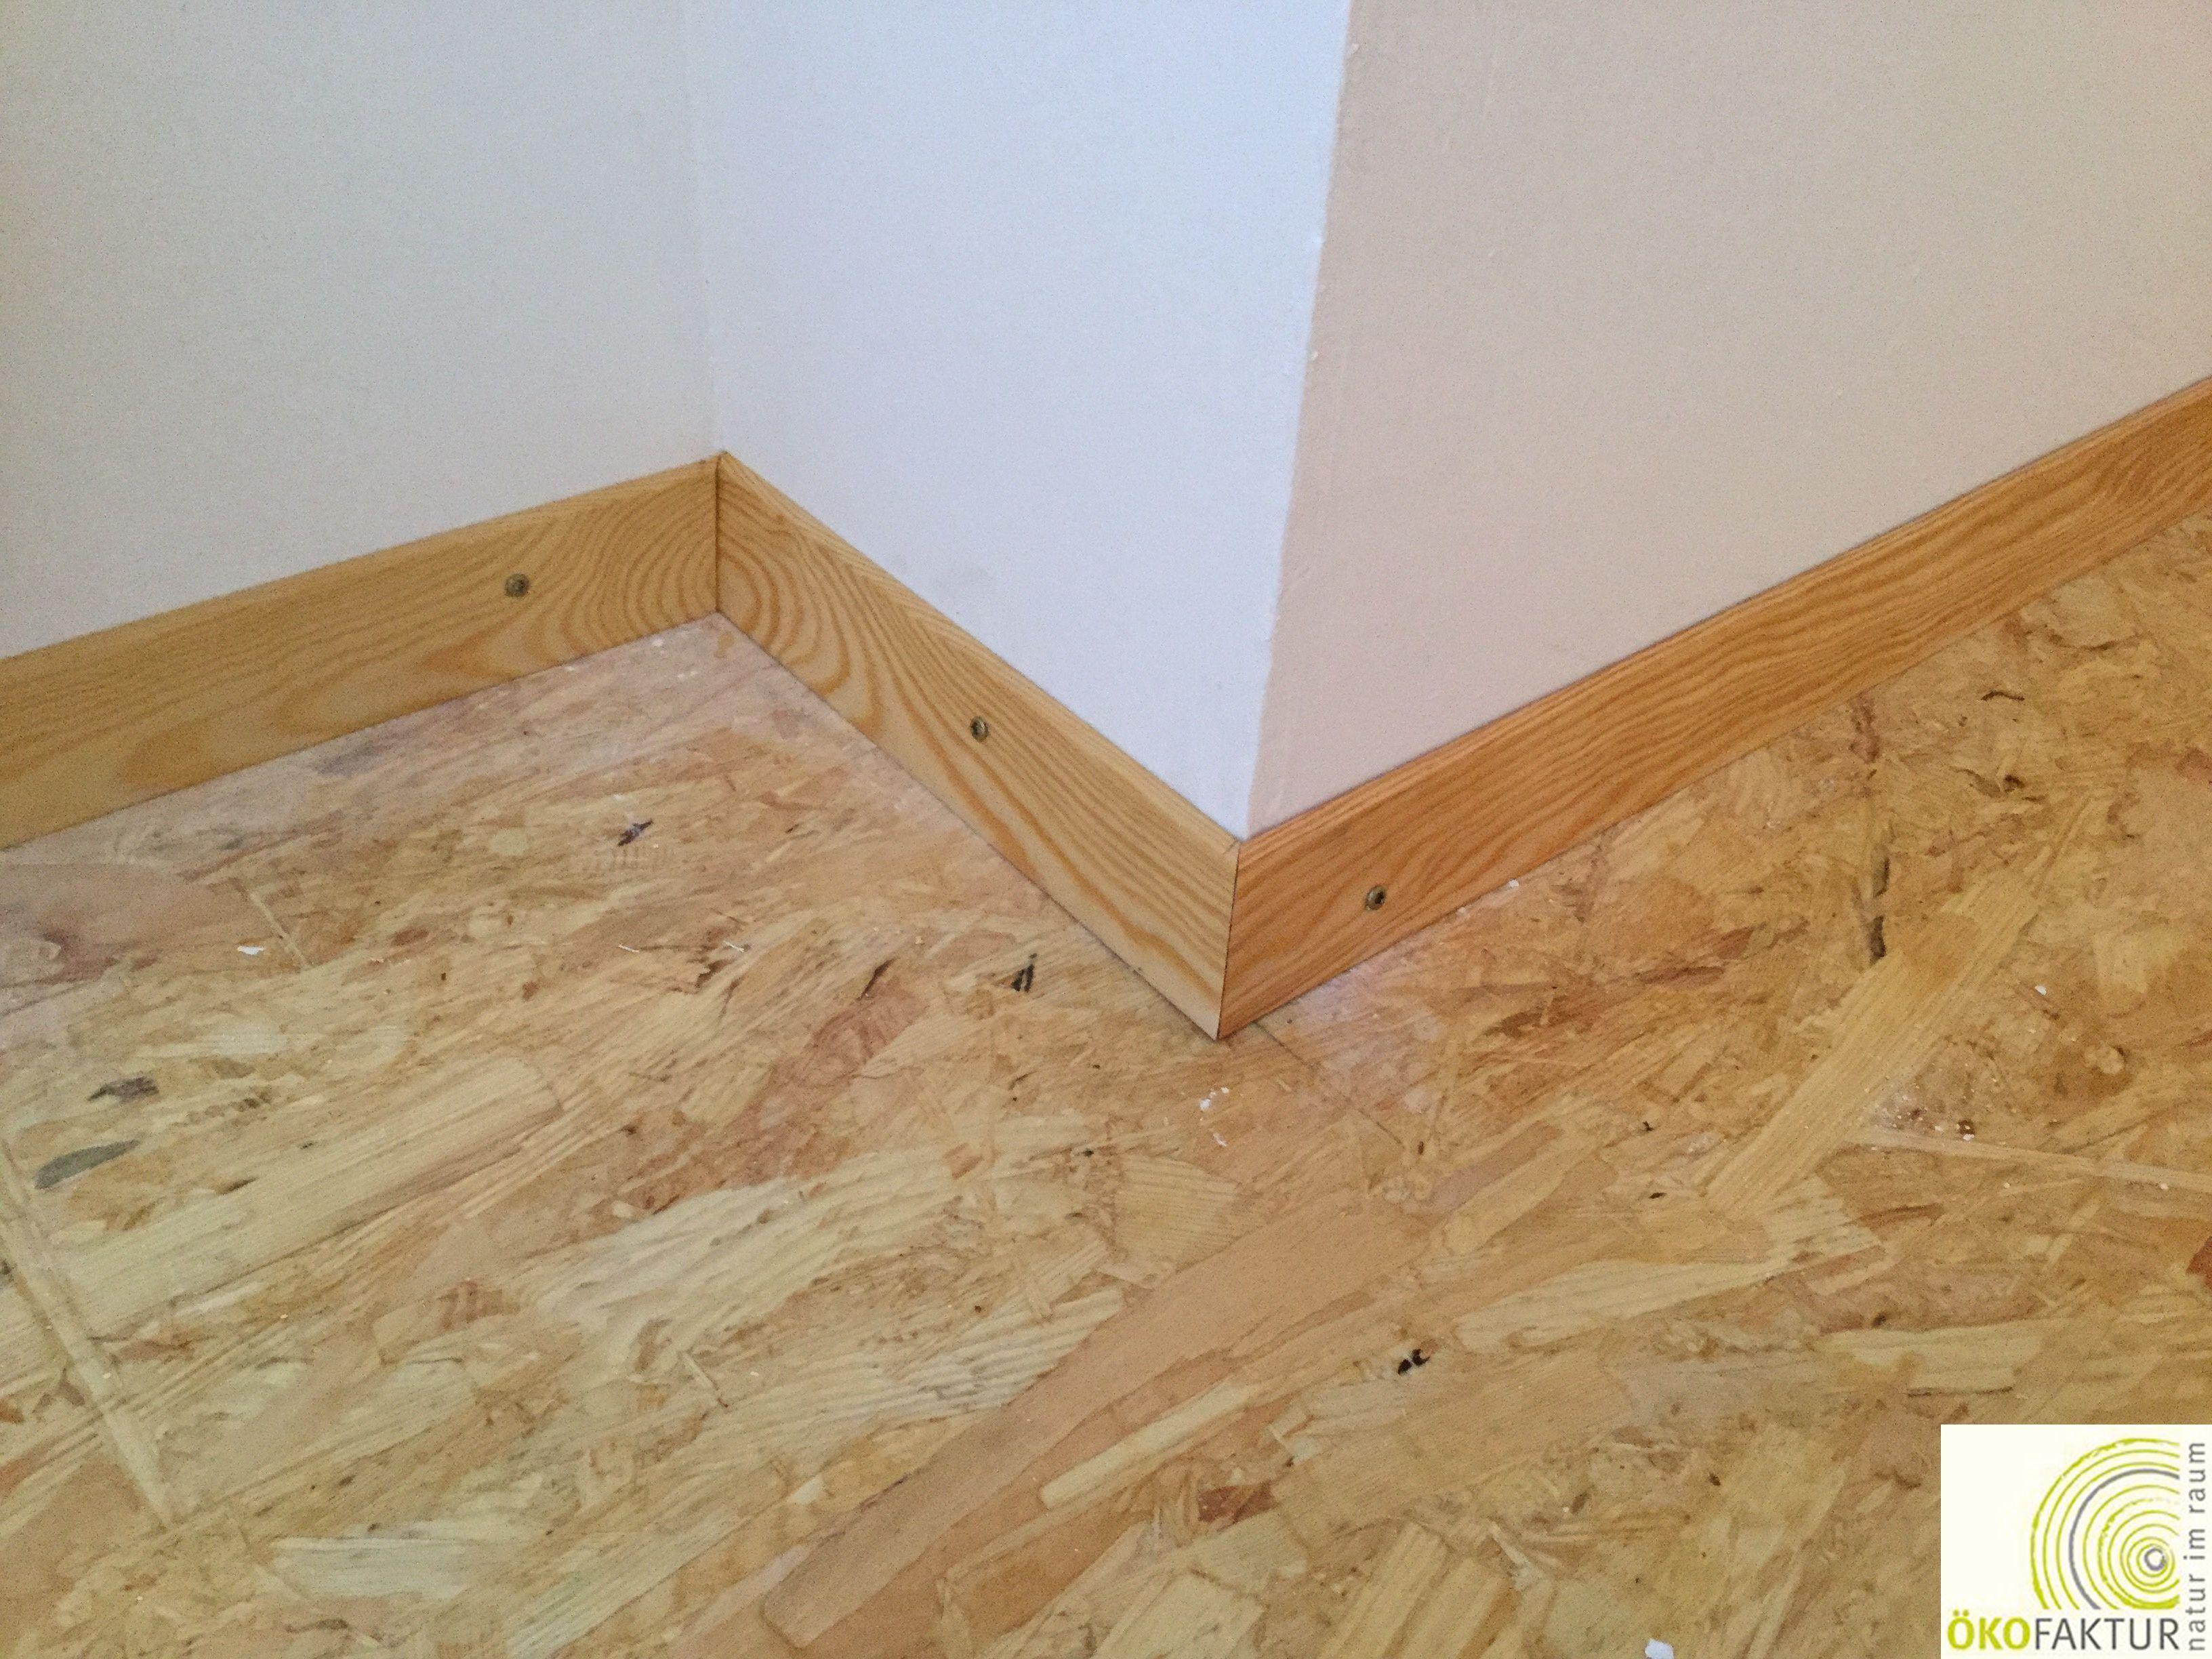 Fußboden Aus Sperrholz ~ Osb fußboden mit massivholz sockelleiste auf gehrung behandelt